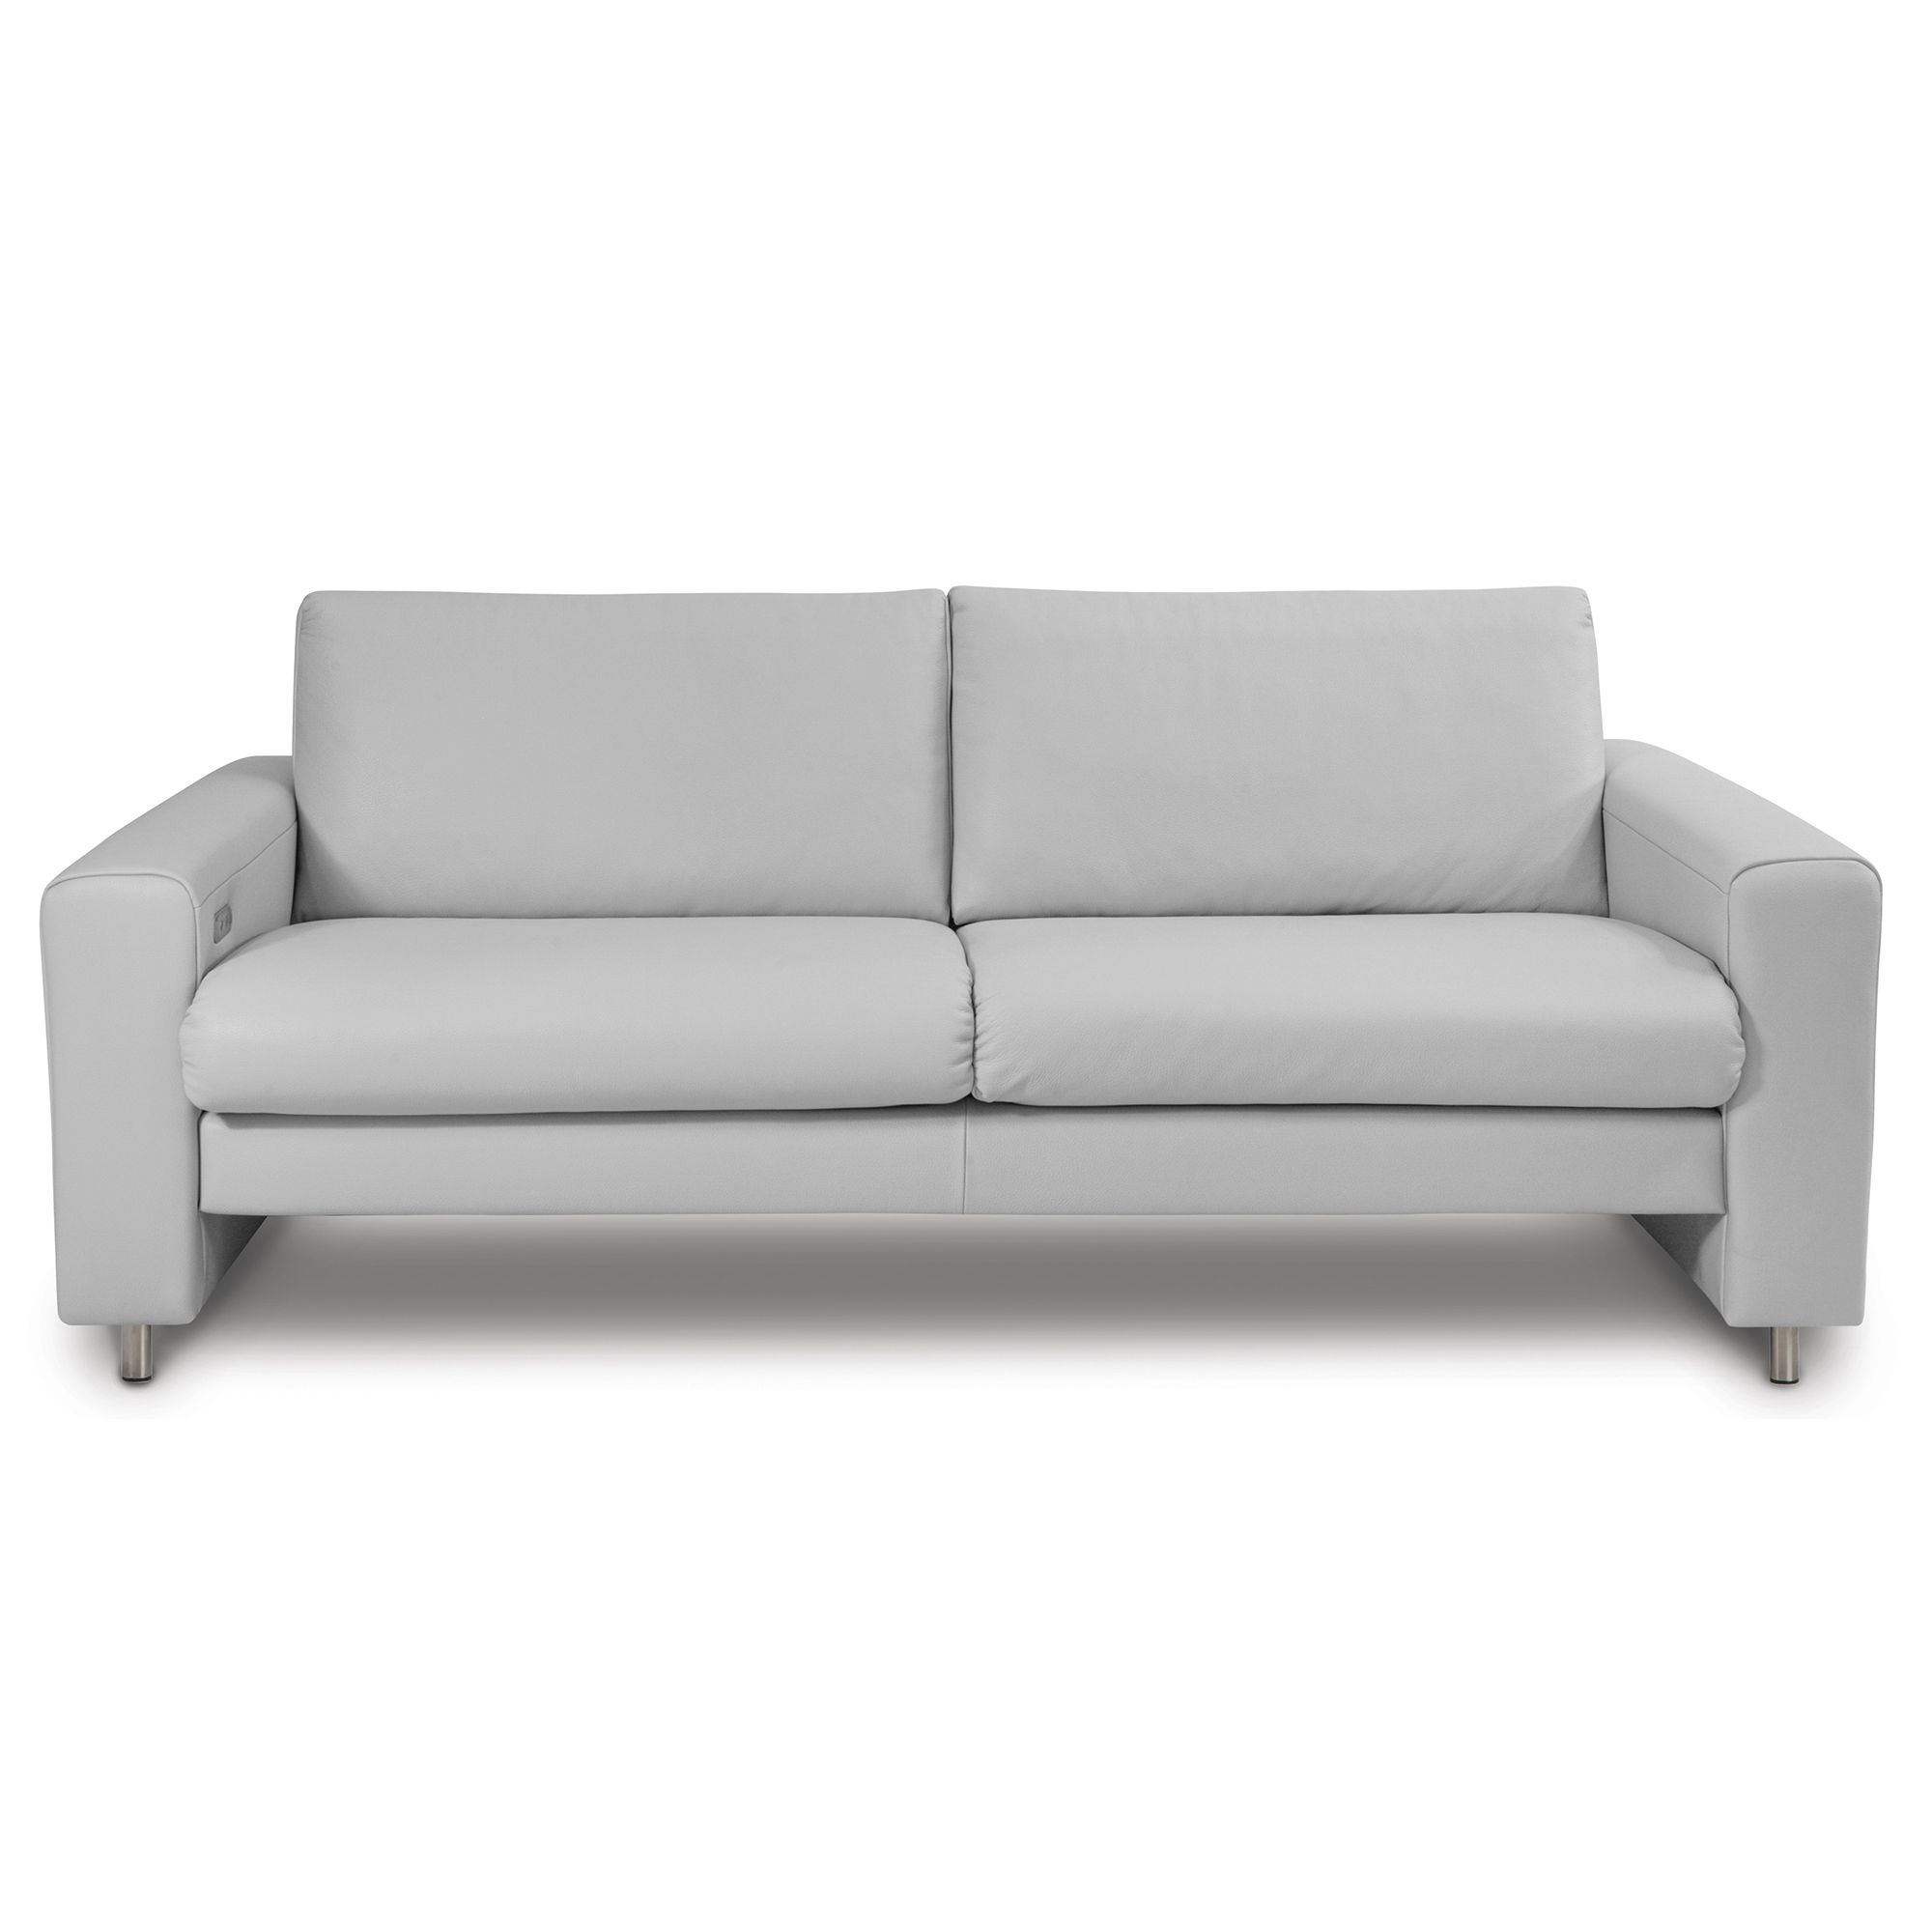 sofa auf raten als neukunde gallery of marquardt sofa diverse versionen whlbar with sofa auf. Black Bedroom Furniture Sets. Home Design Ideas